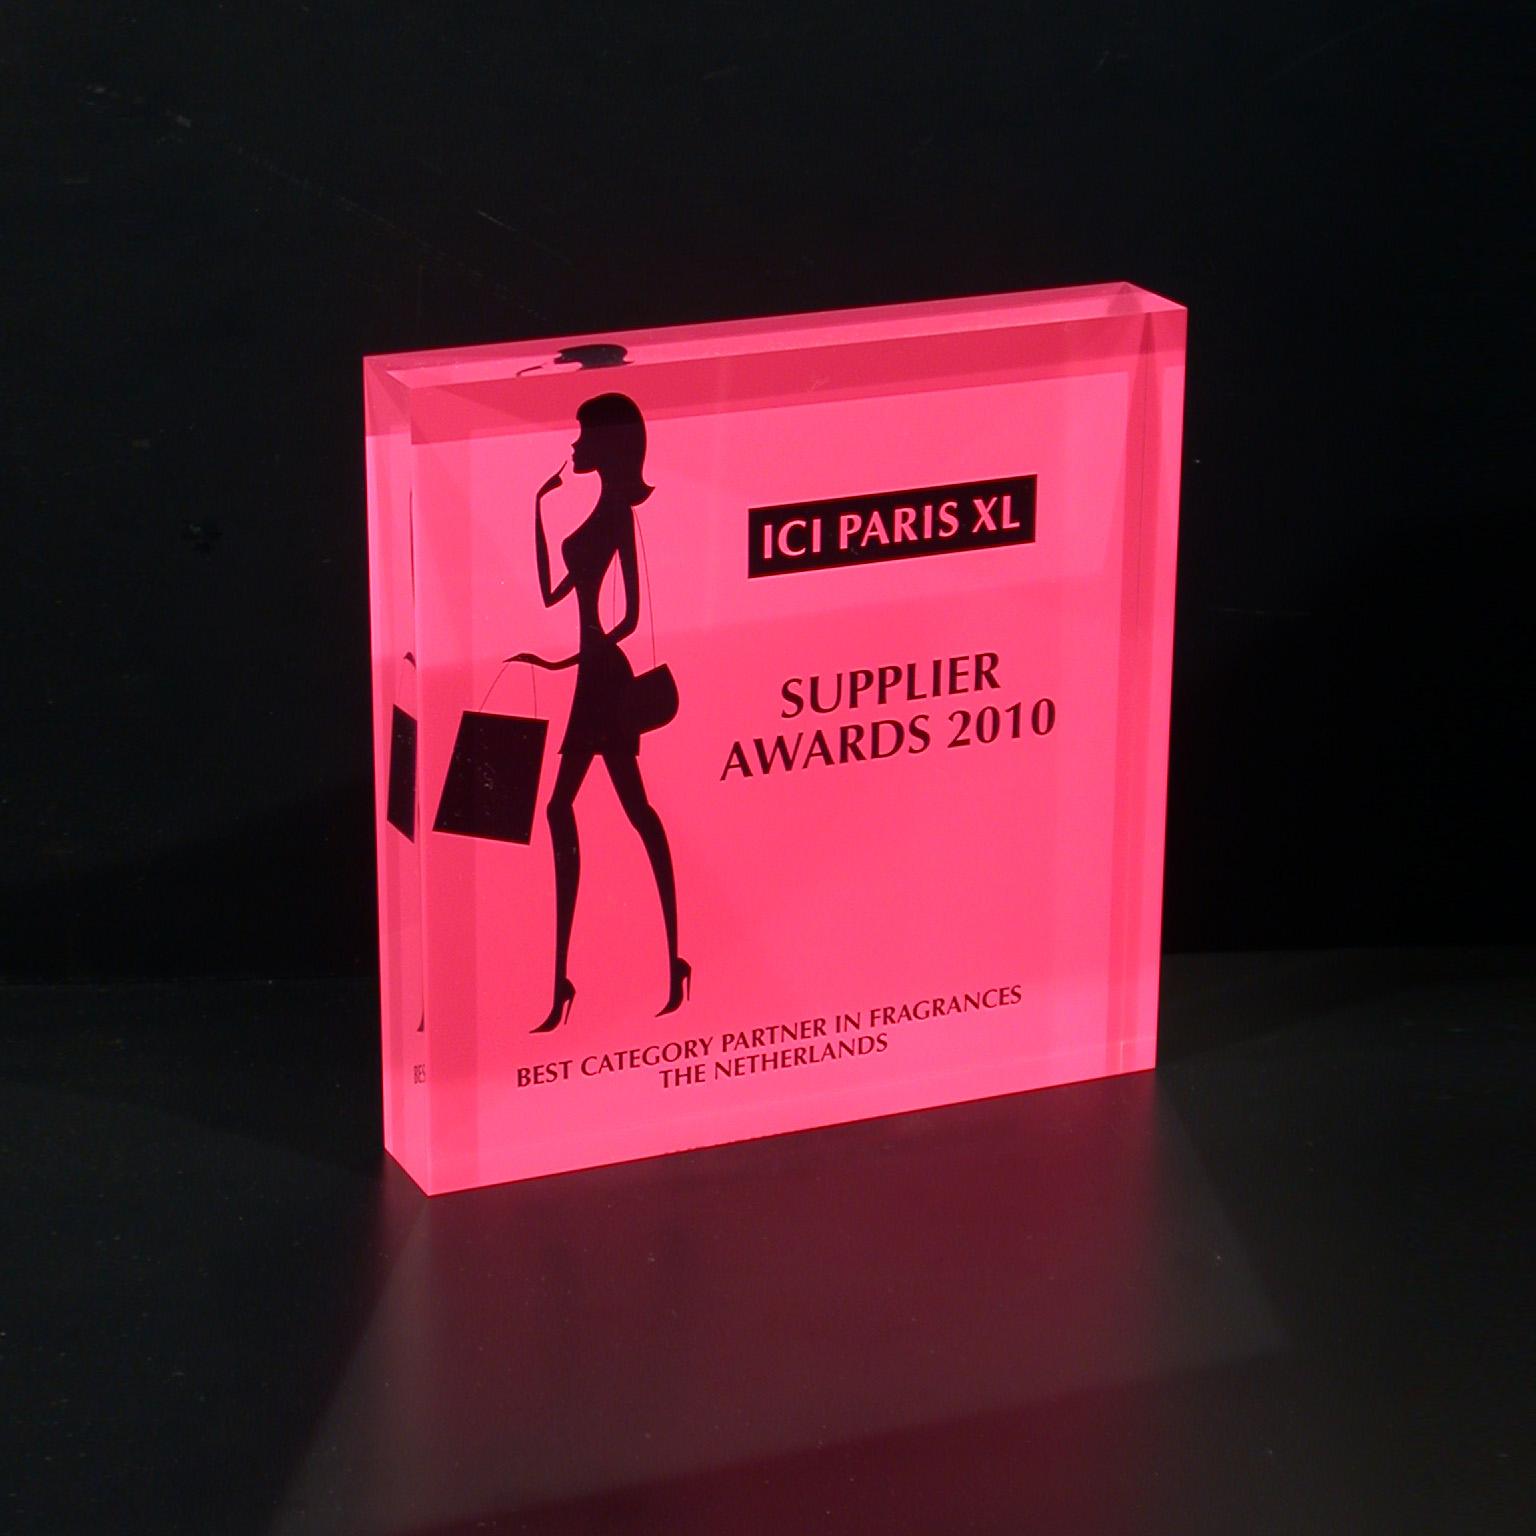 Award plexi